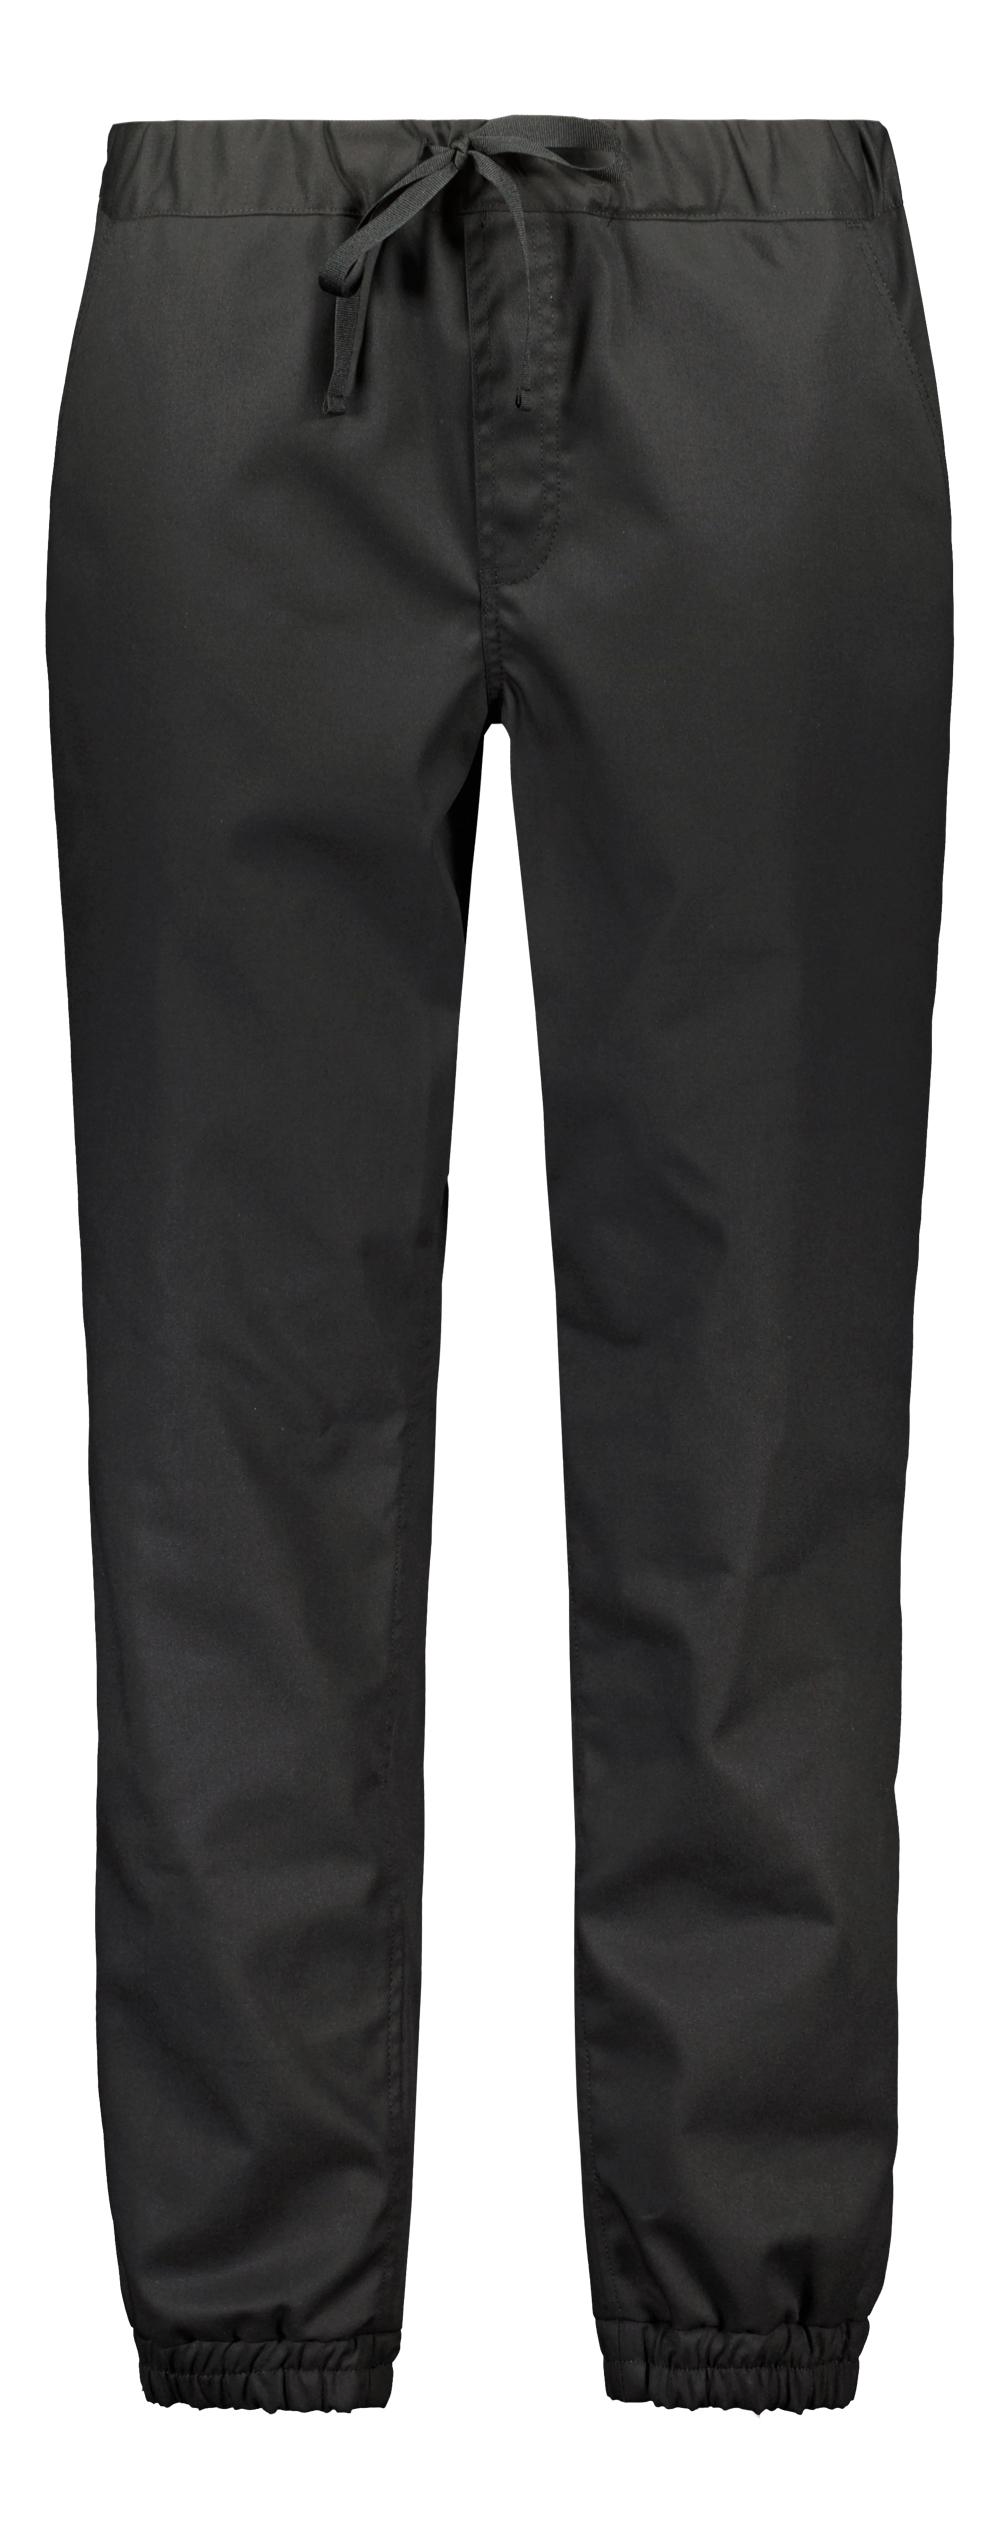 Robi housut, unisex, musta